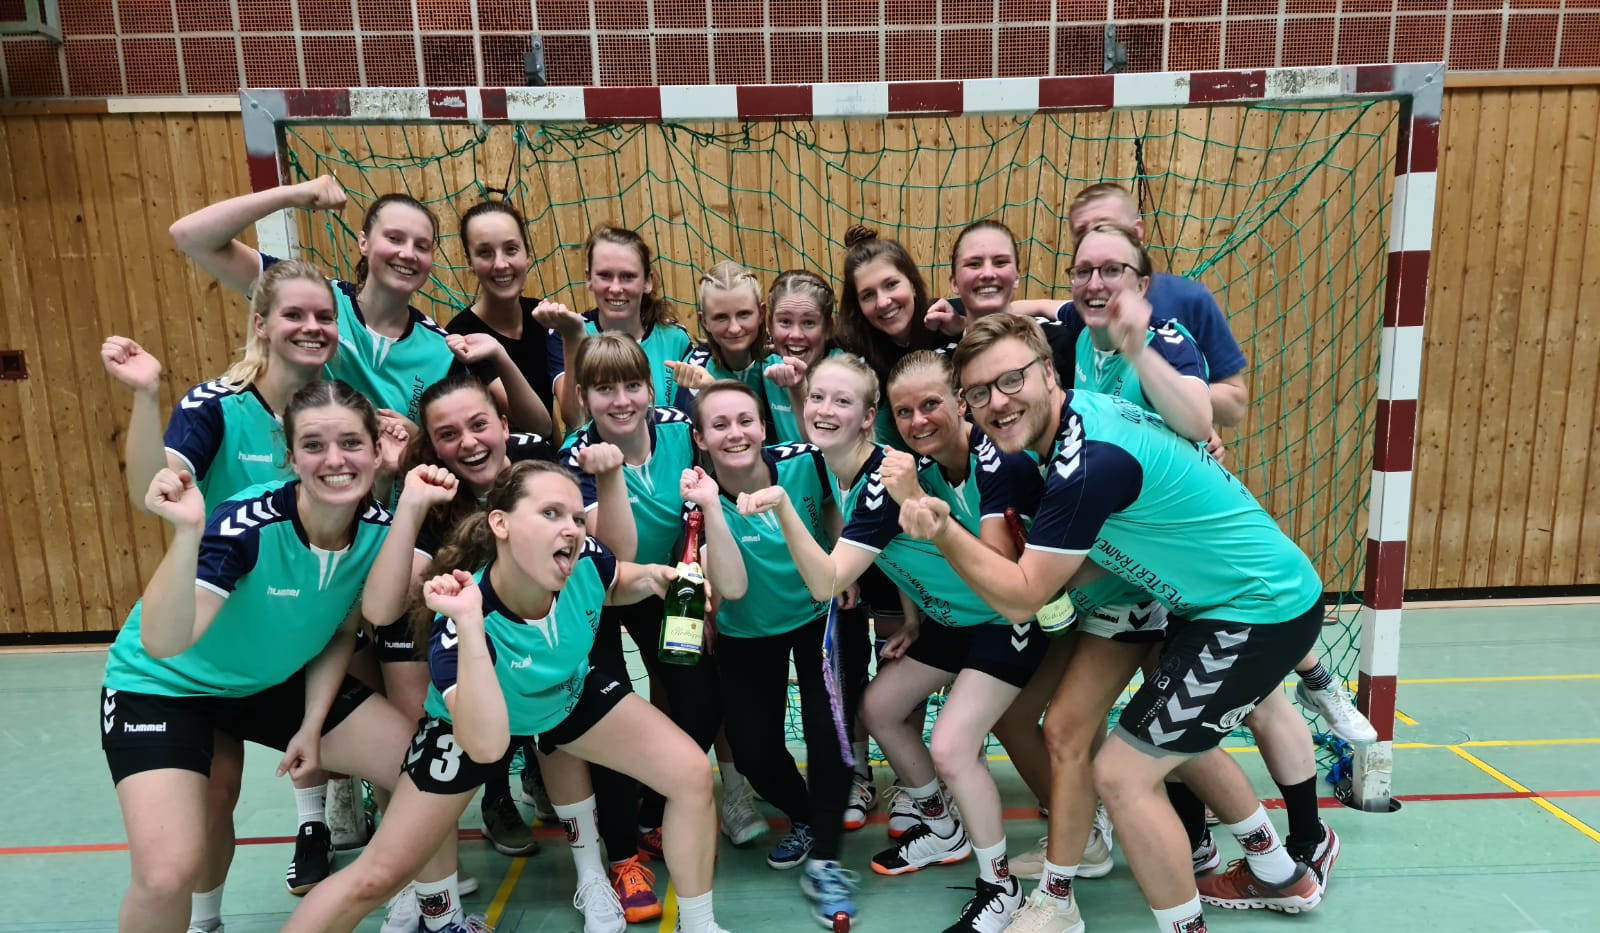 2. Damen 2020-21 Landesliga Süd